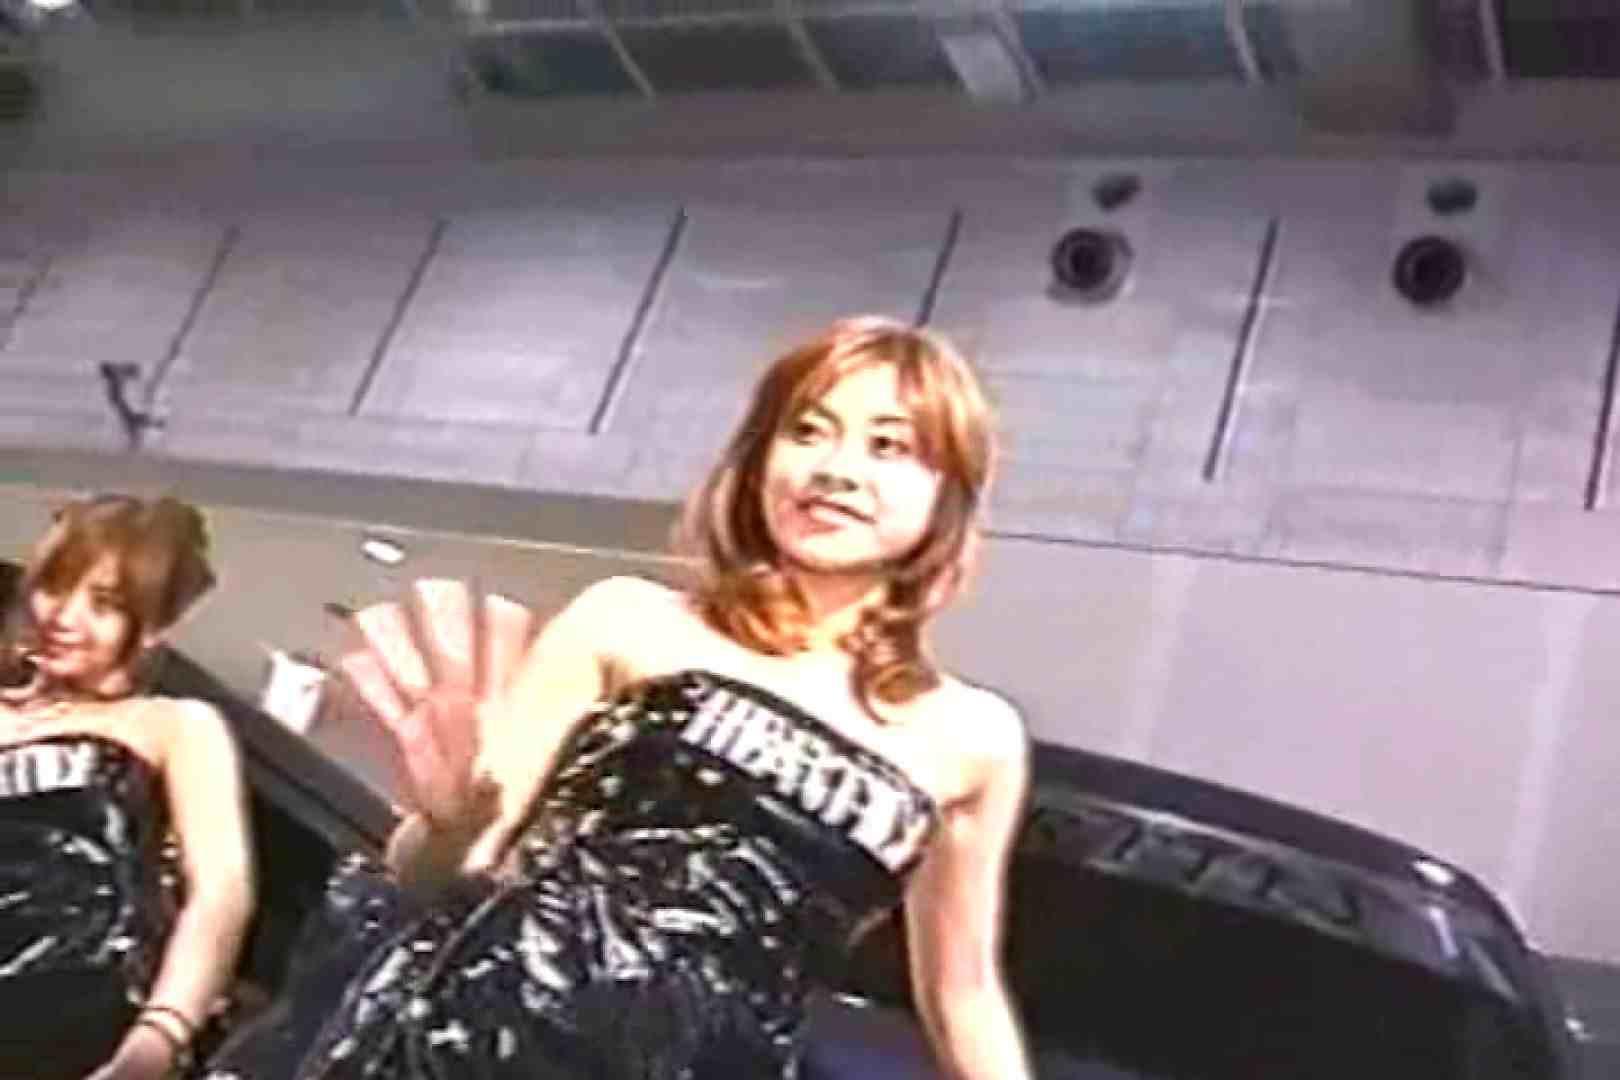 RQカメラ地獄Vol.23 卑猥 盗み撮り動画 106pic 88